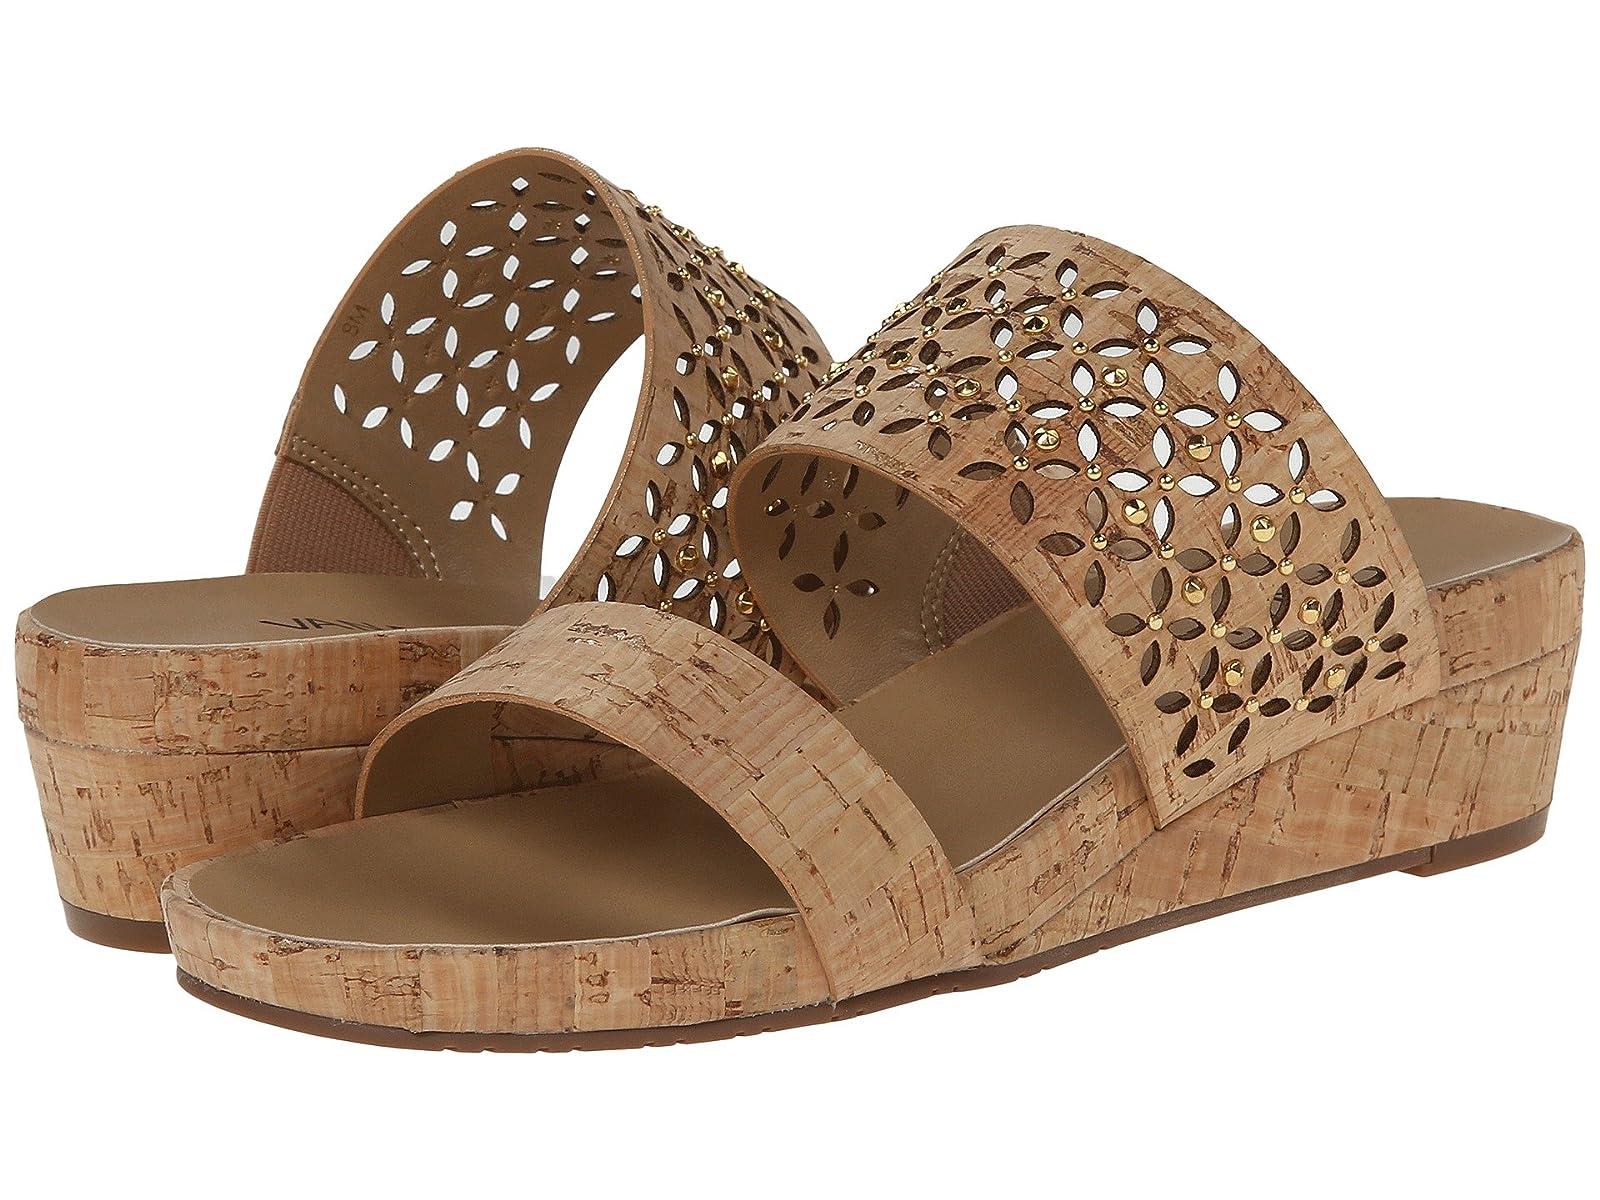 Vaneli KirimaCheap and distinctive eye-catching shoes